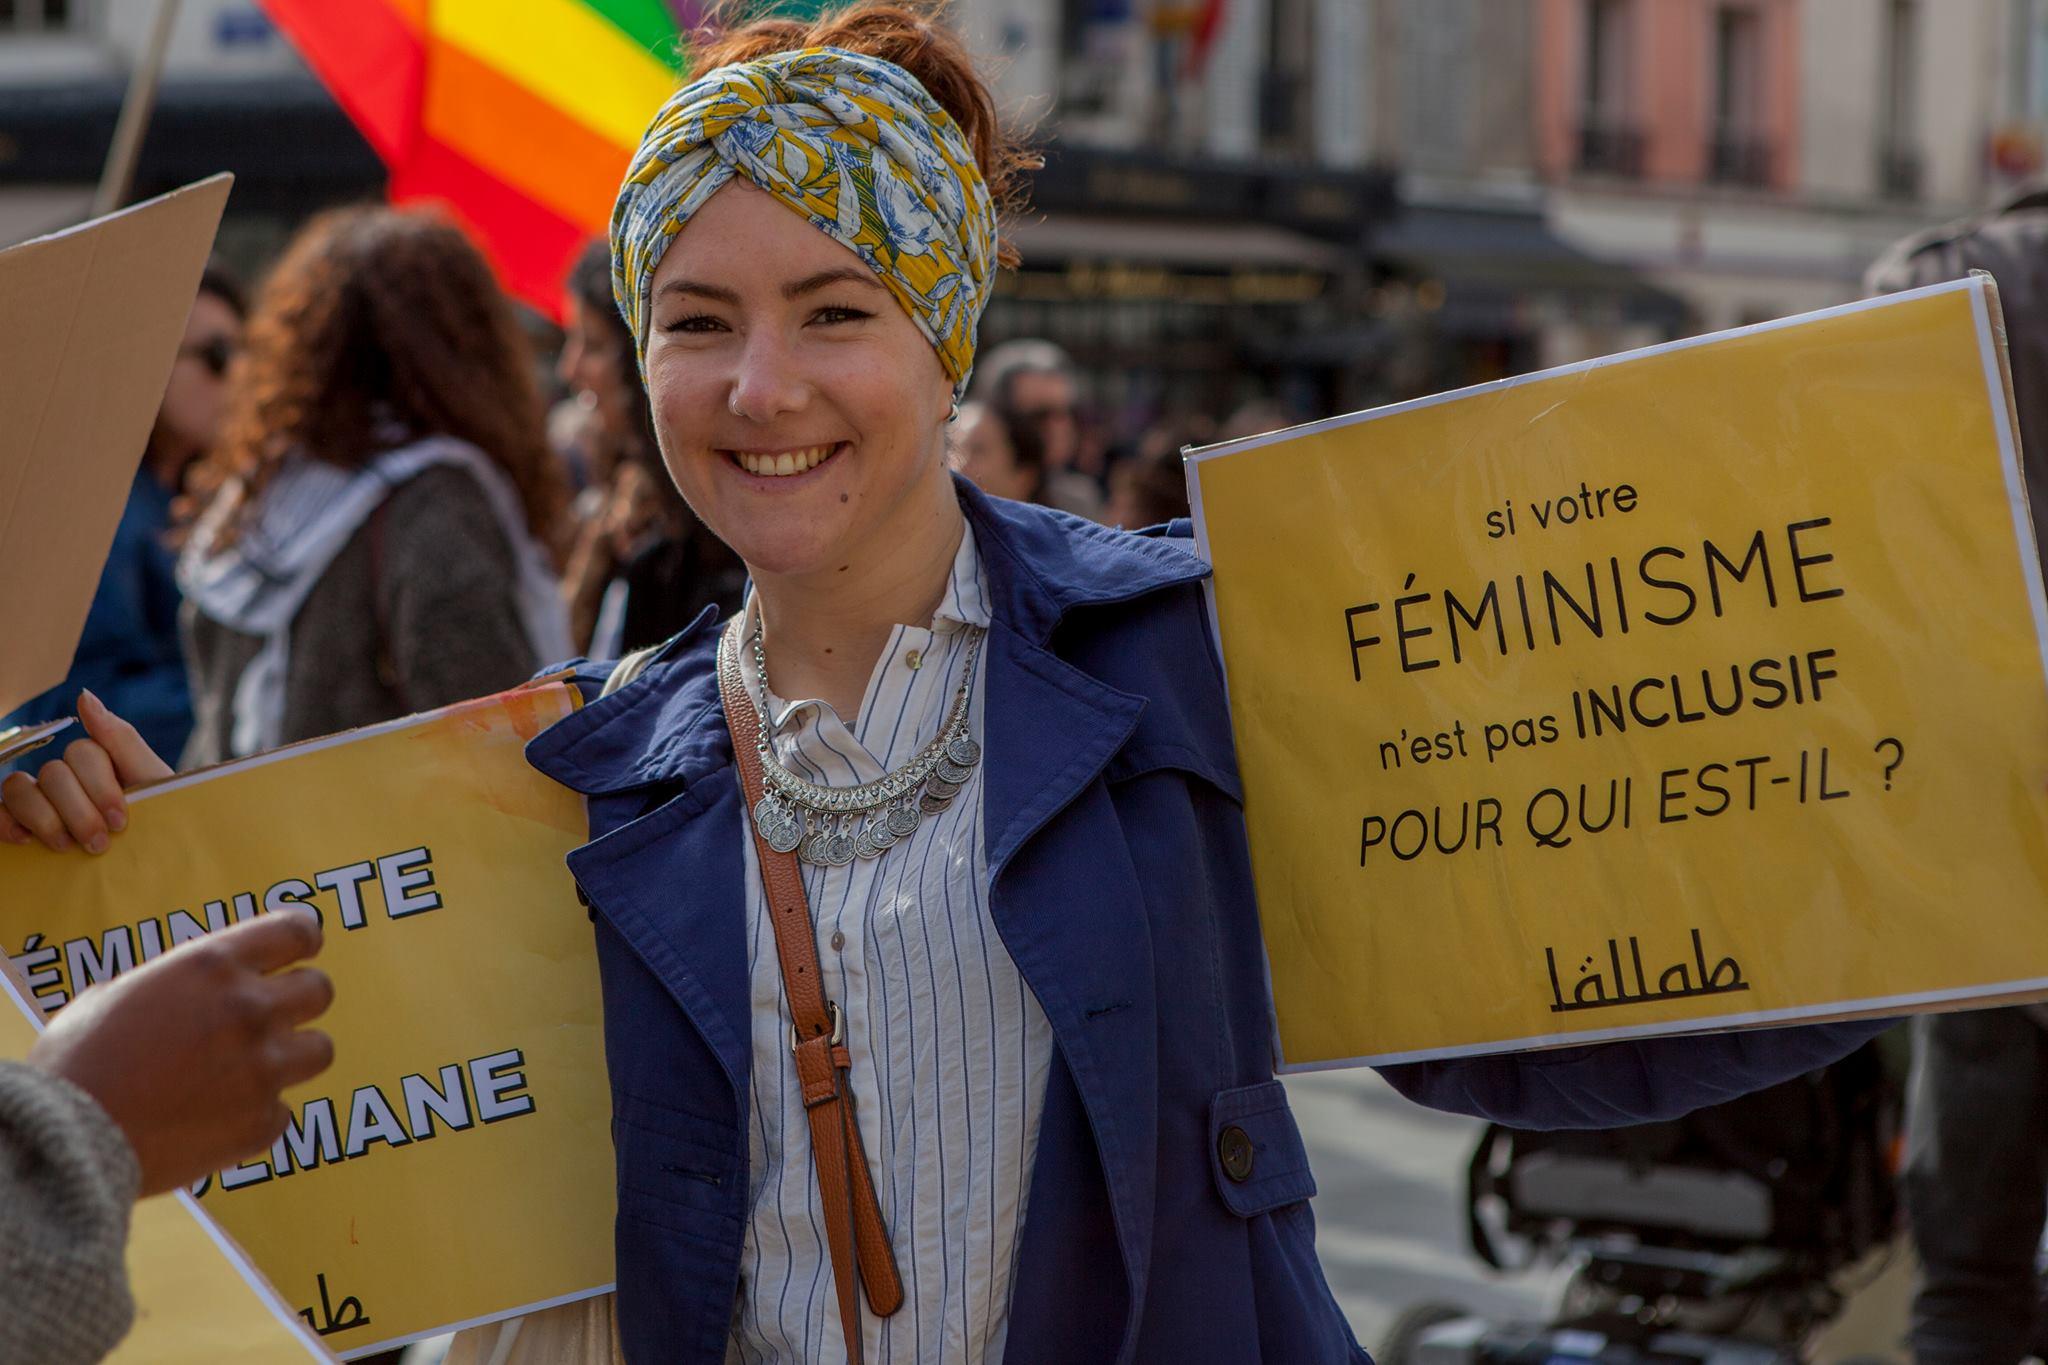 Lallab Manifestation féministe 11 mars 5